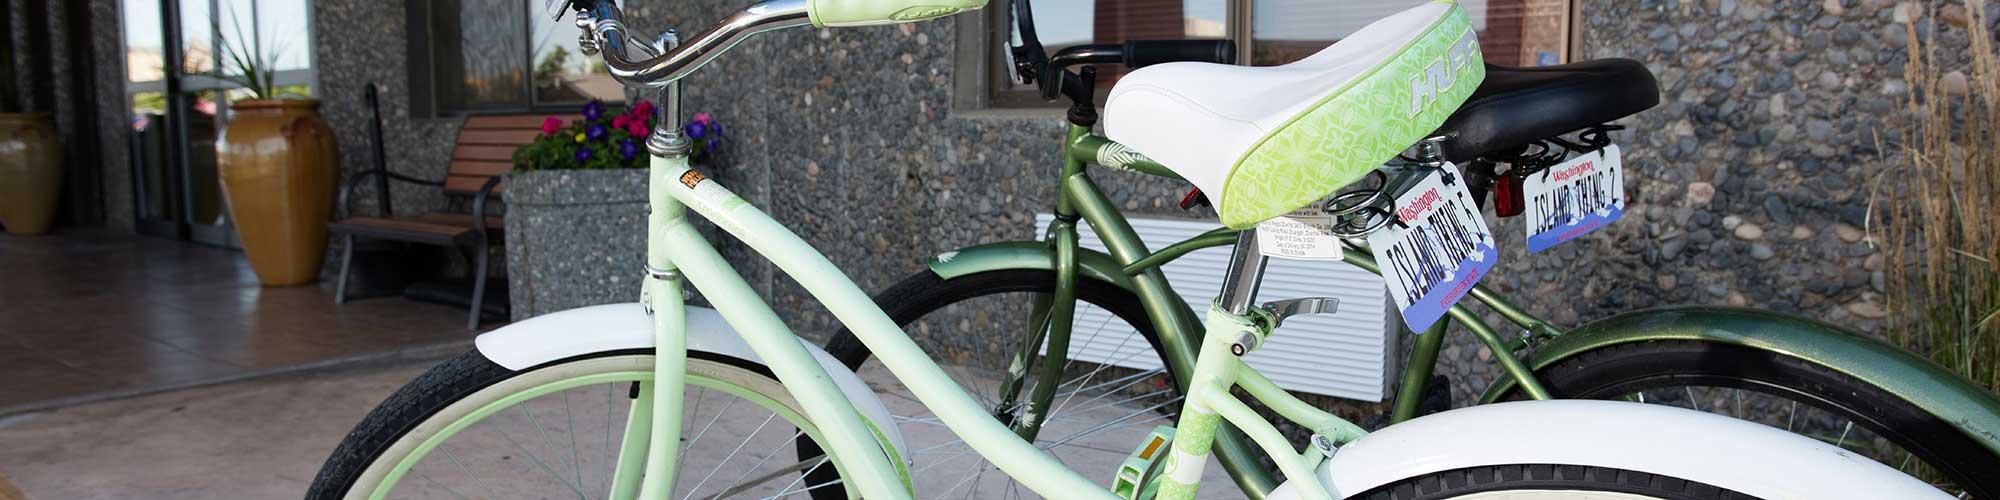 Clover Island Inn free bike rental